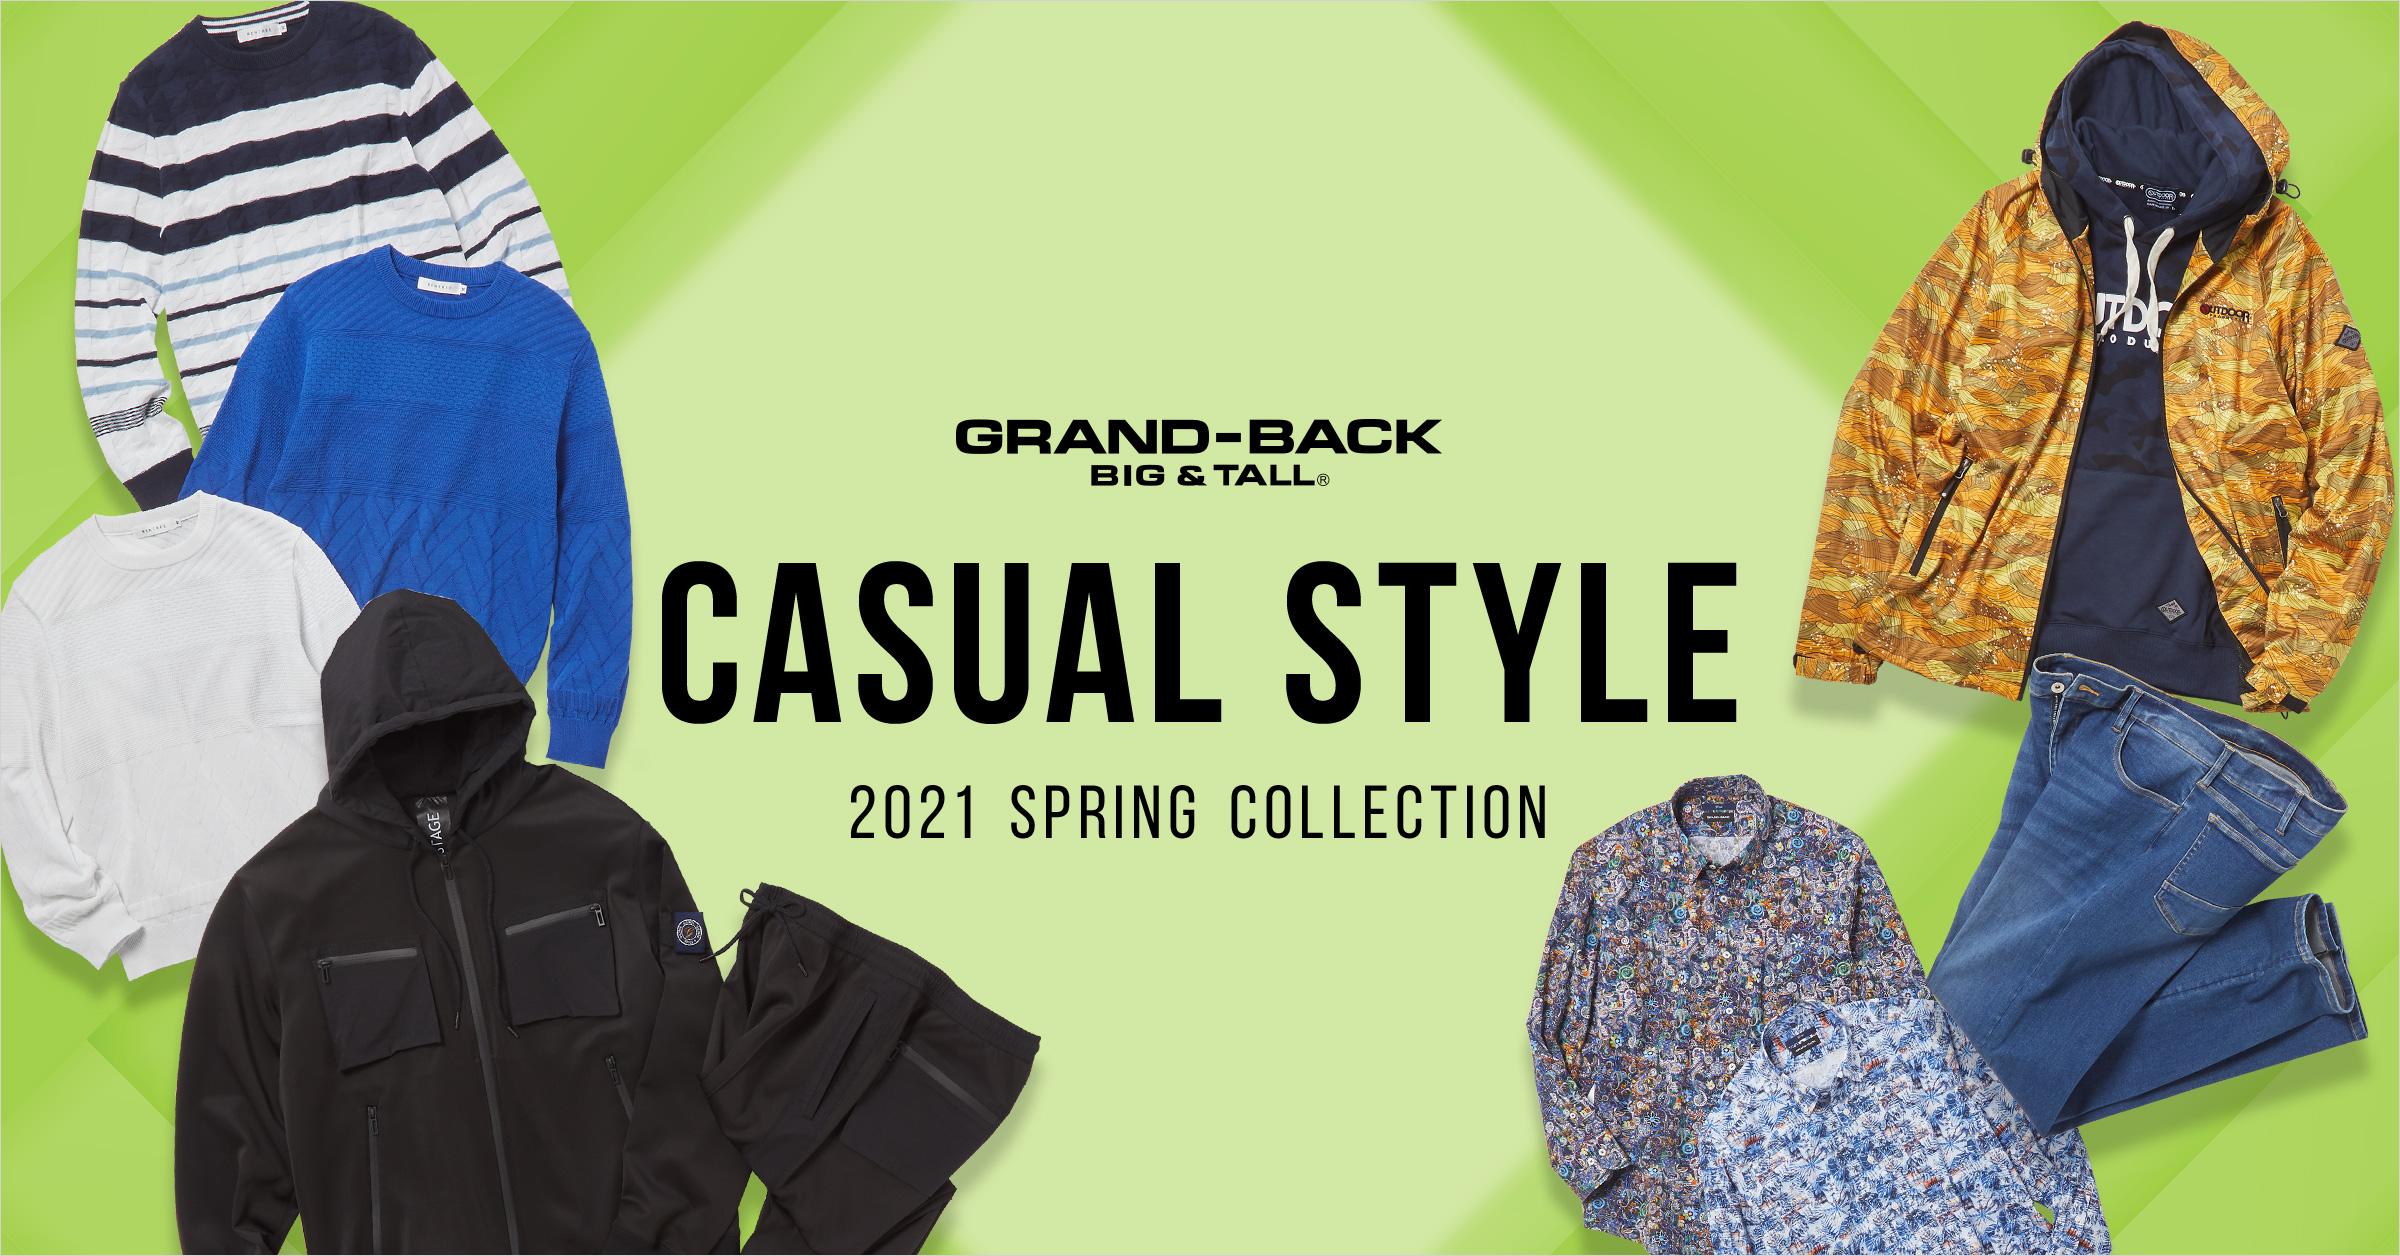 GRAND-BACK (グランバック) 2021 Spring Casual style(2021 スプリング カジュアルスタイル)